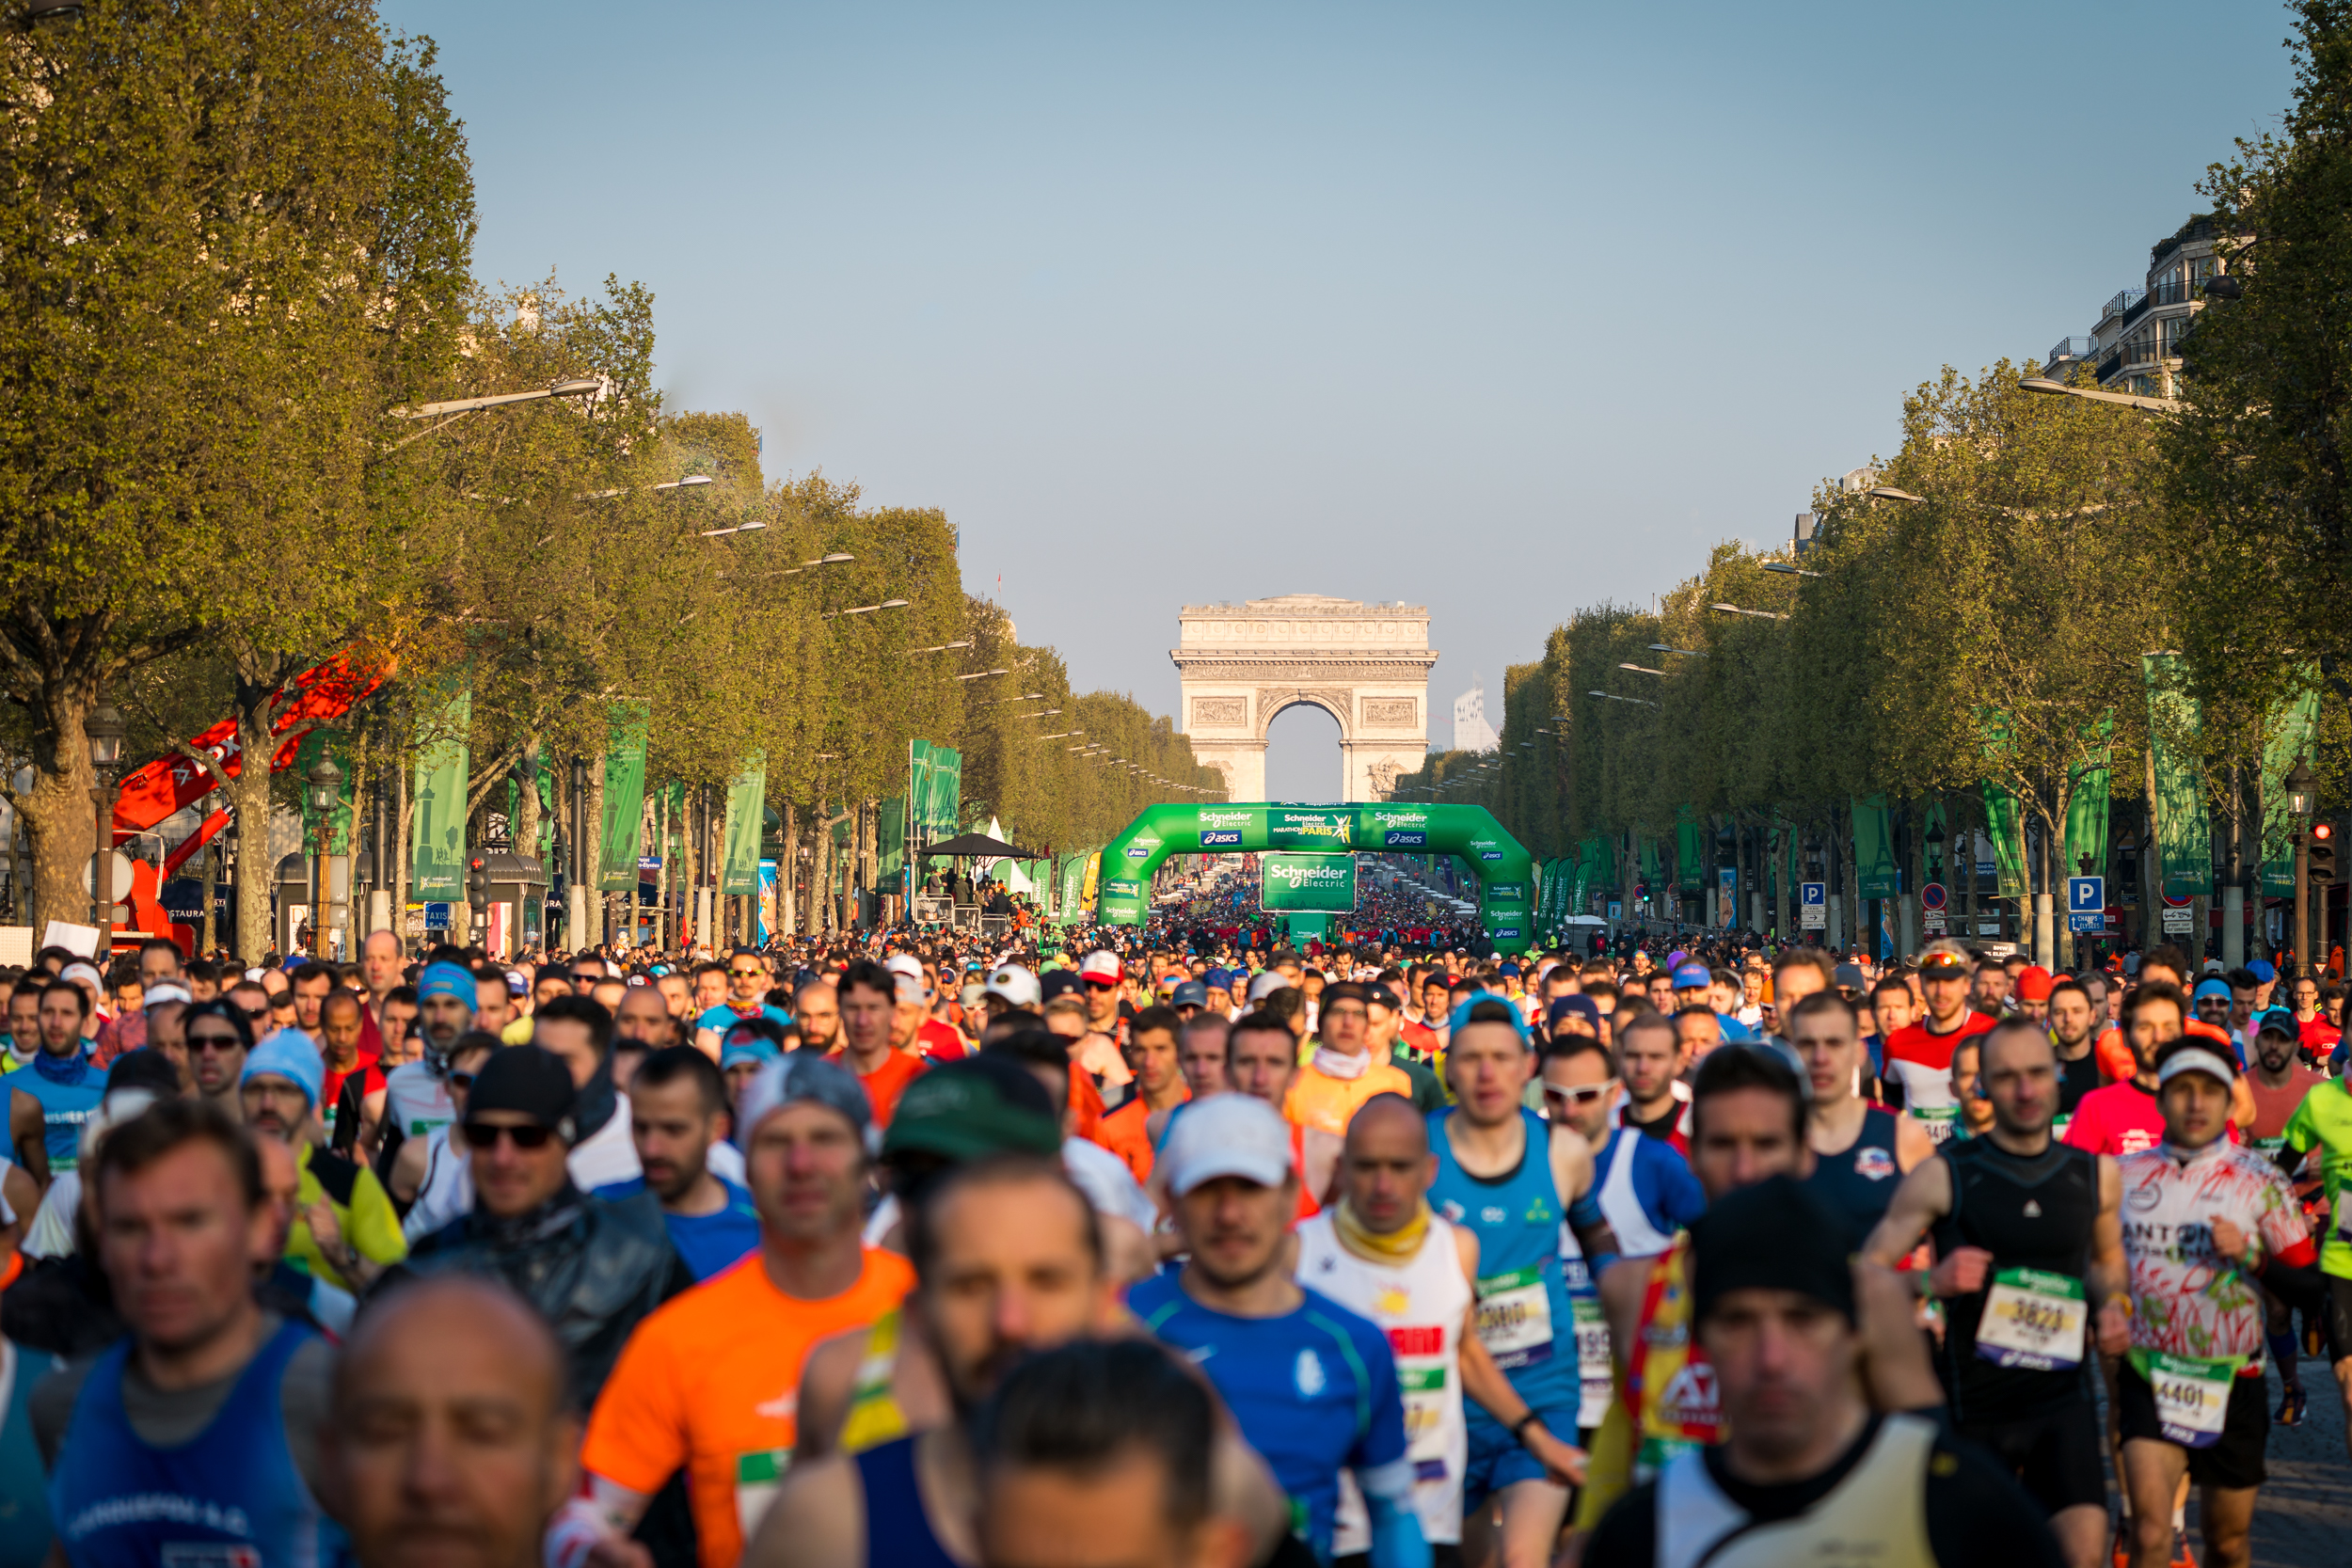 BMW_Marathon Paris 2019_Florian Leger_SHARE & DARE_HD_ N°-49.jpg